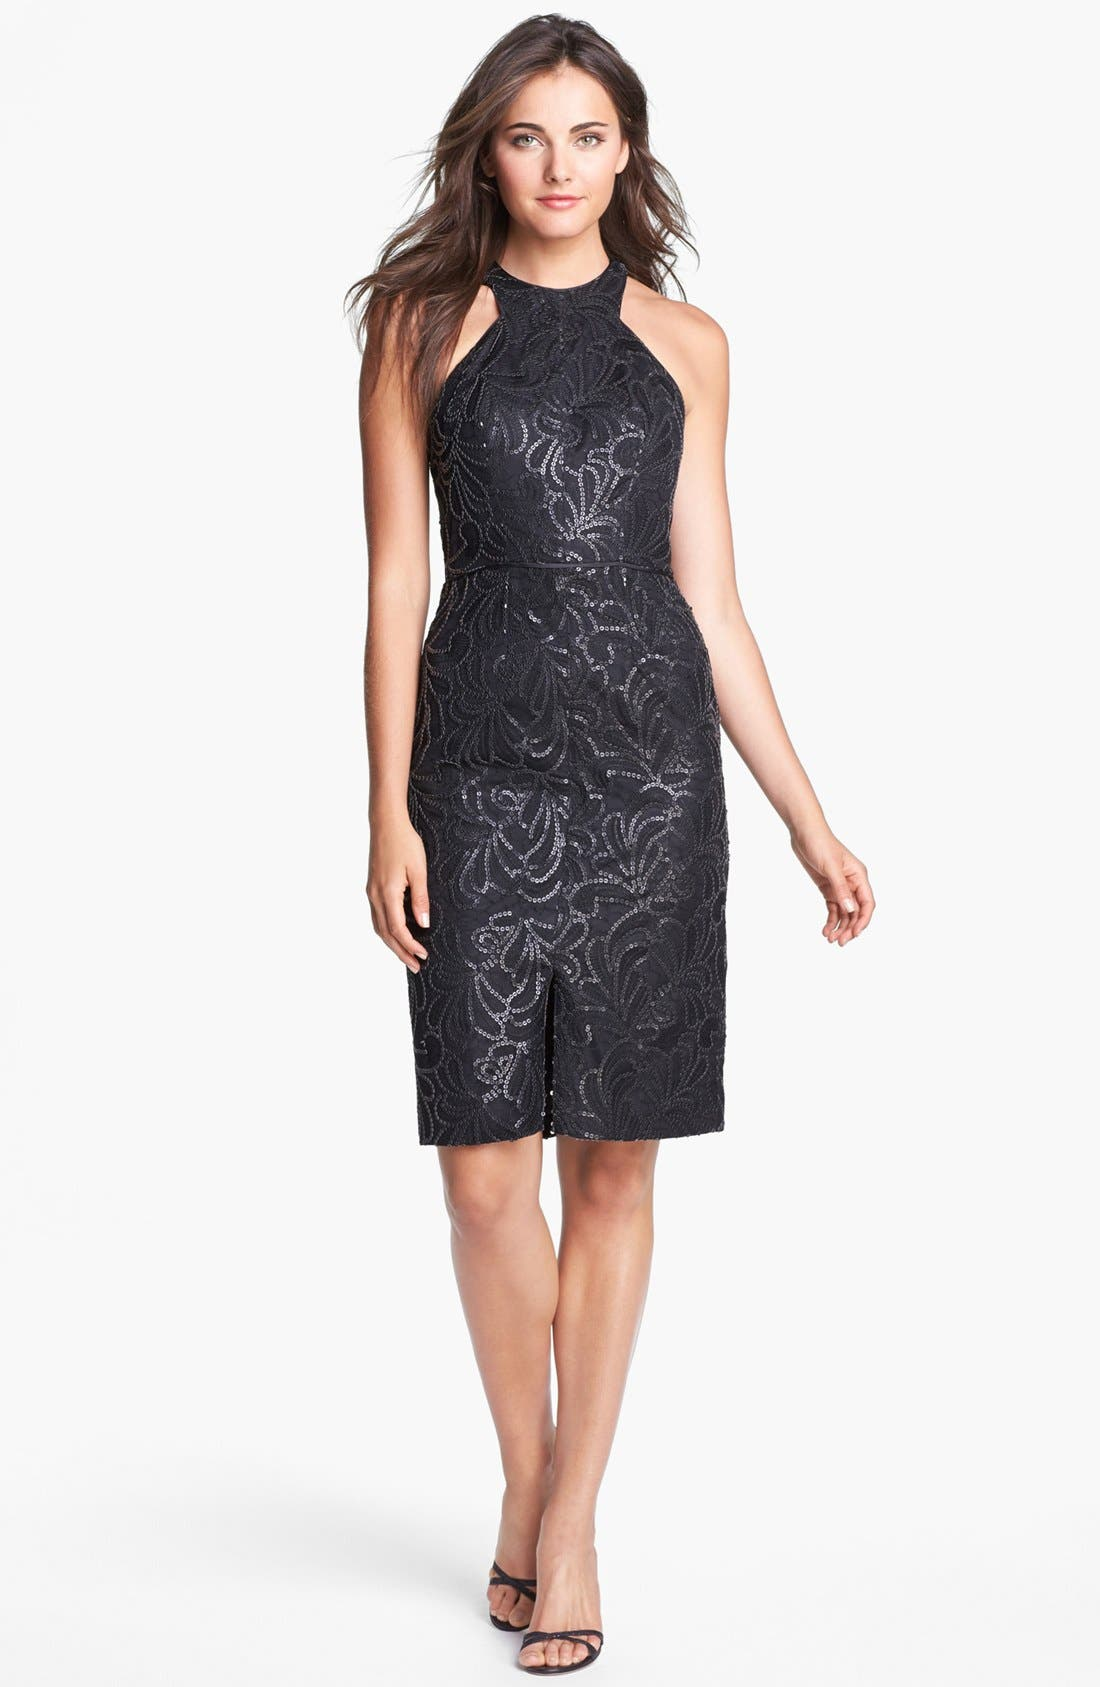 Alternate Image 1 Selected - Jill Jill Stuart Faux Leather Sequin Embellished Sheath Dress